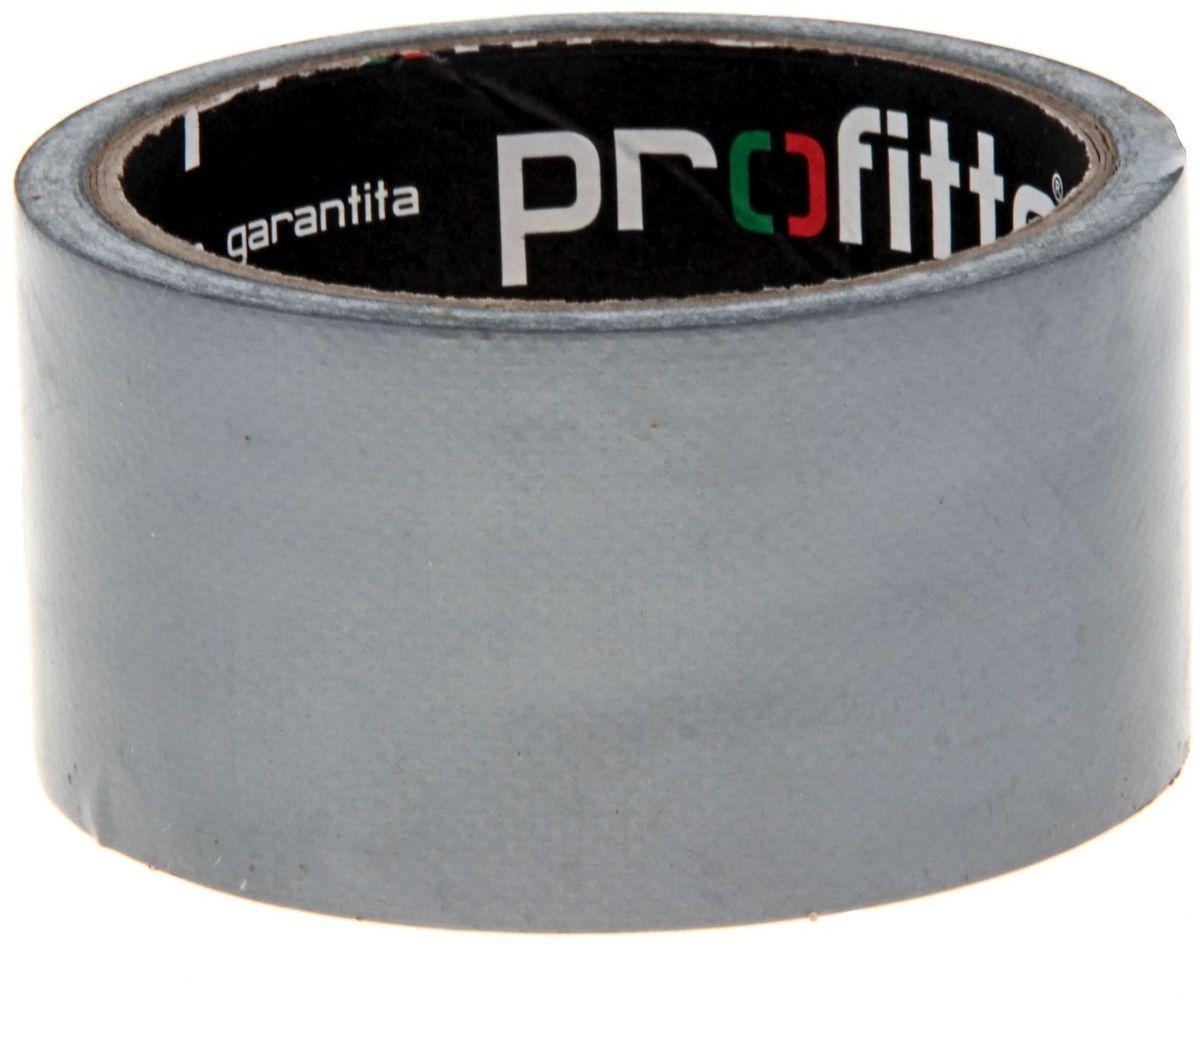 Profitto Клейкая лента армированная 48 мм х 10 м цвет серебристый лента армированная fit универсальная цвет синий 48 мм х 10 м